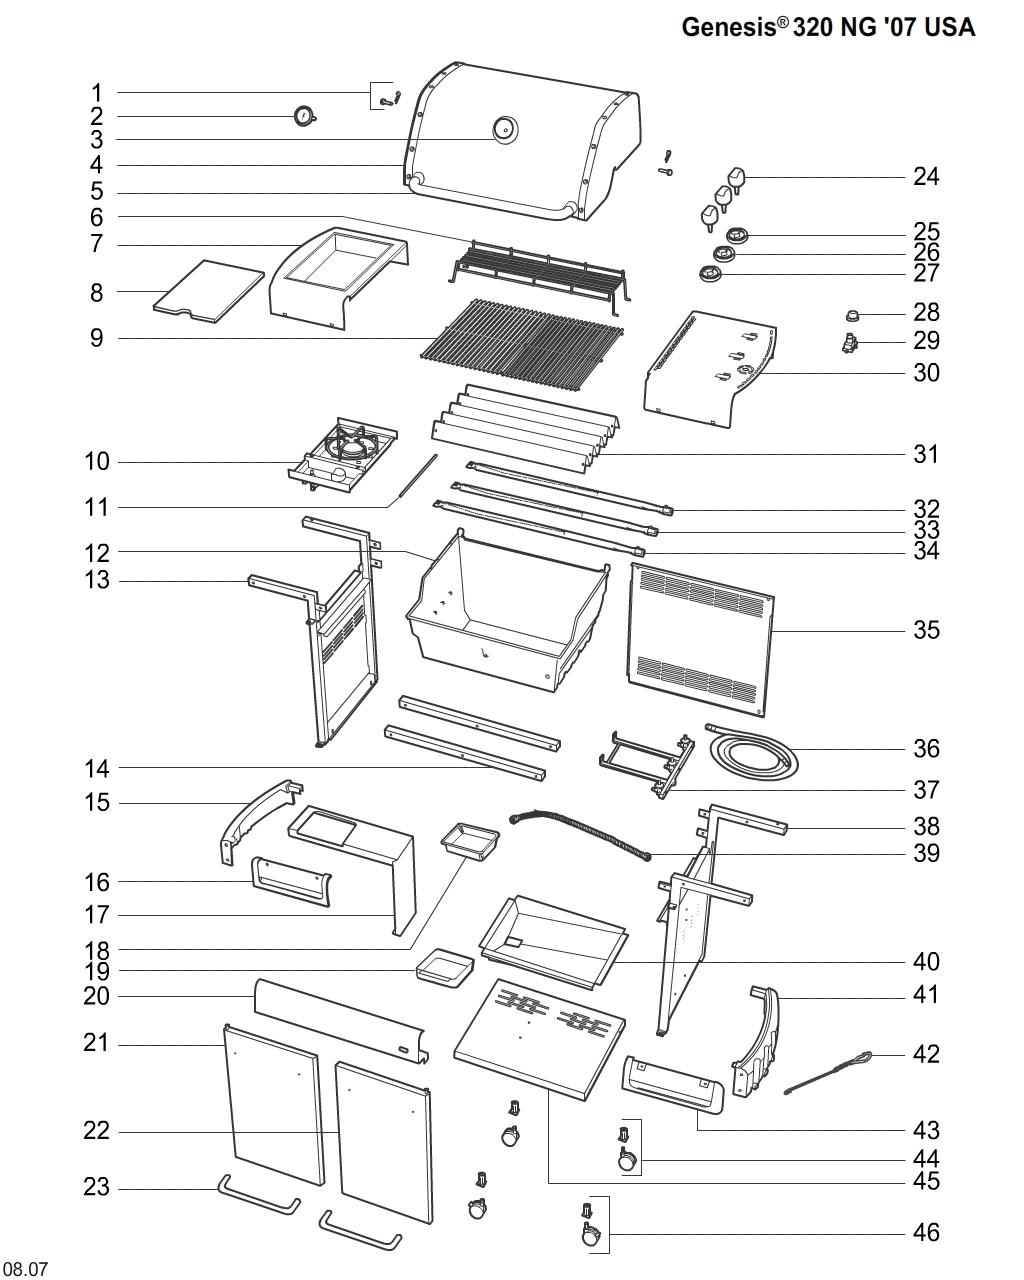 Schematic Image 3850101